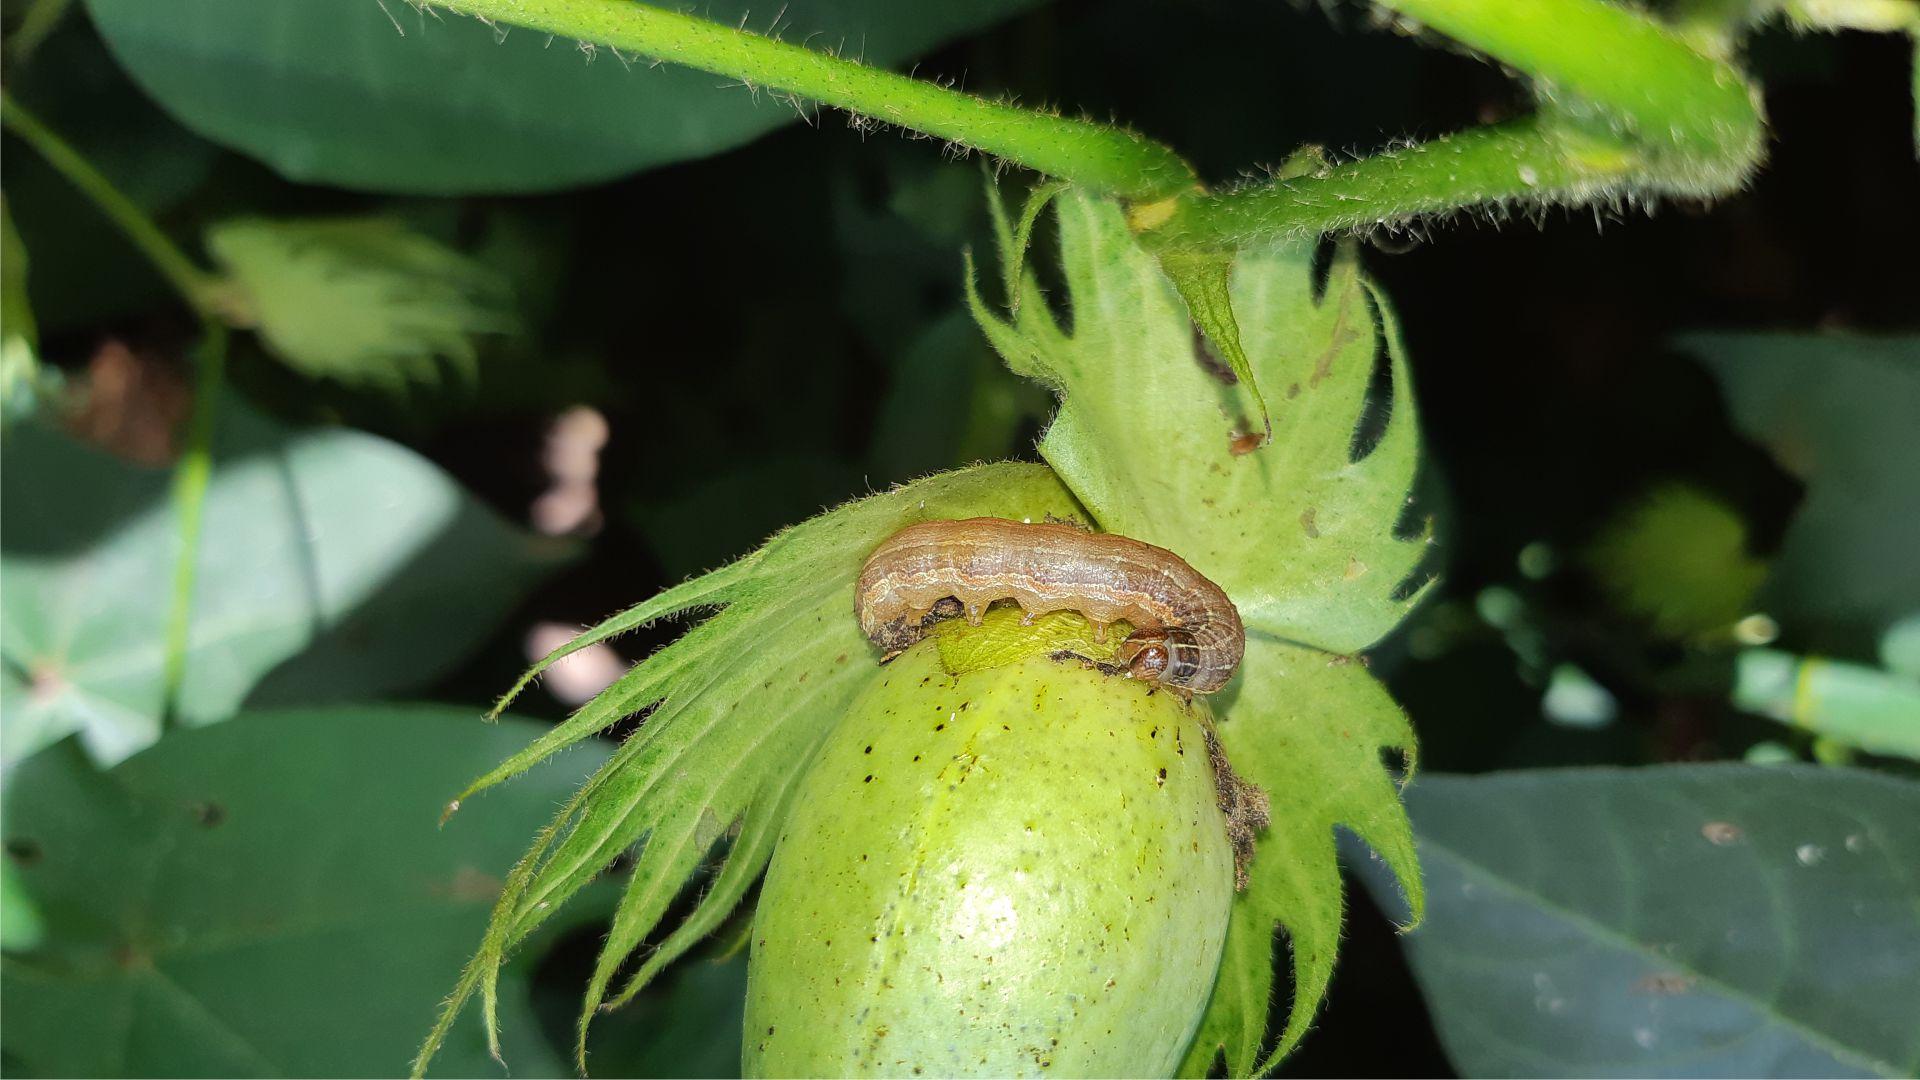 Lagarta Spodoptera atacando maçã